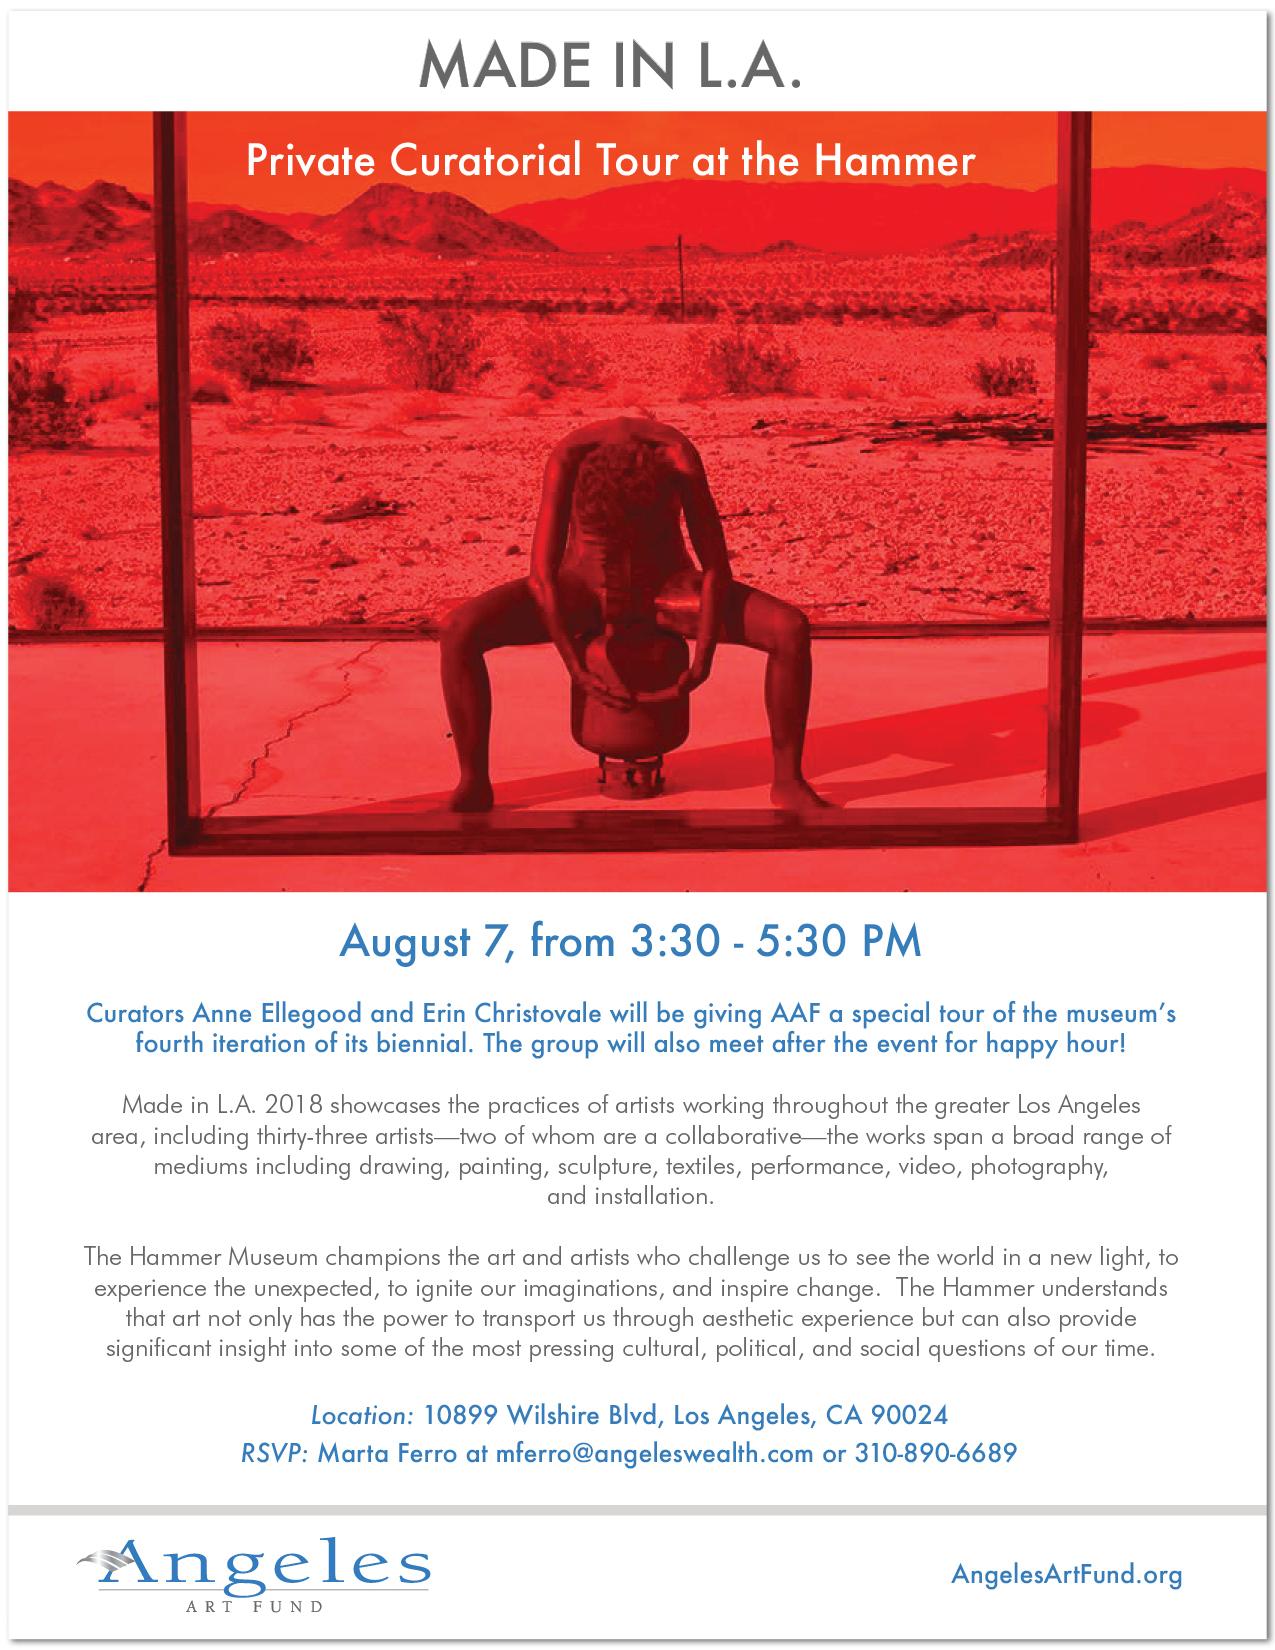 Angeles Art Fund Invites_border8.jpg